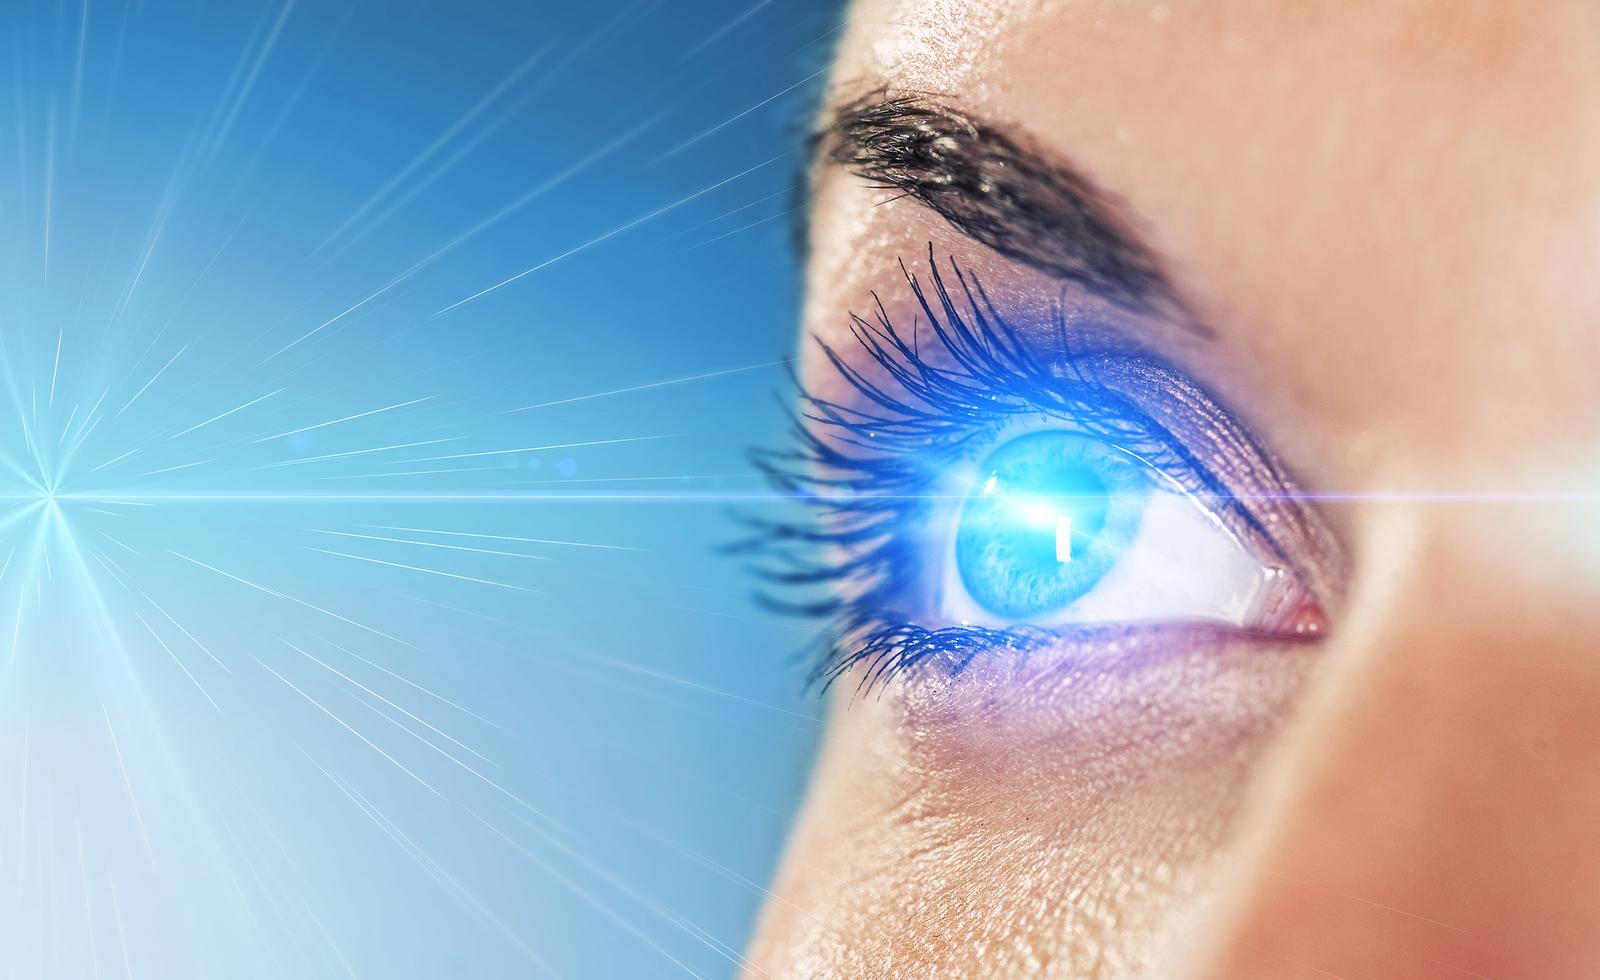 Eye on a blue background (shallow DoF)